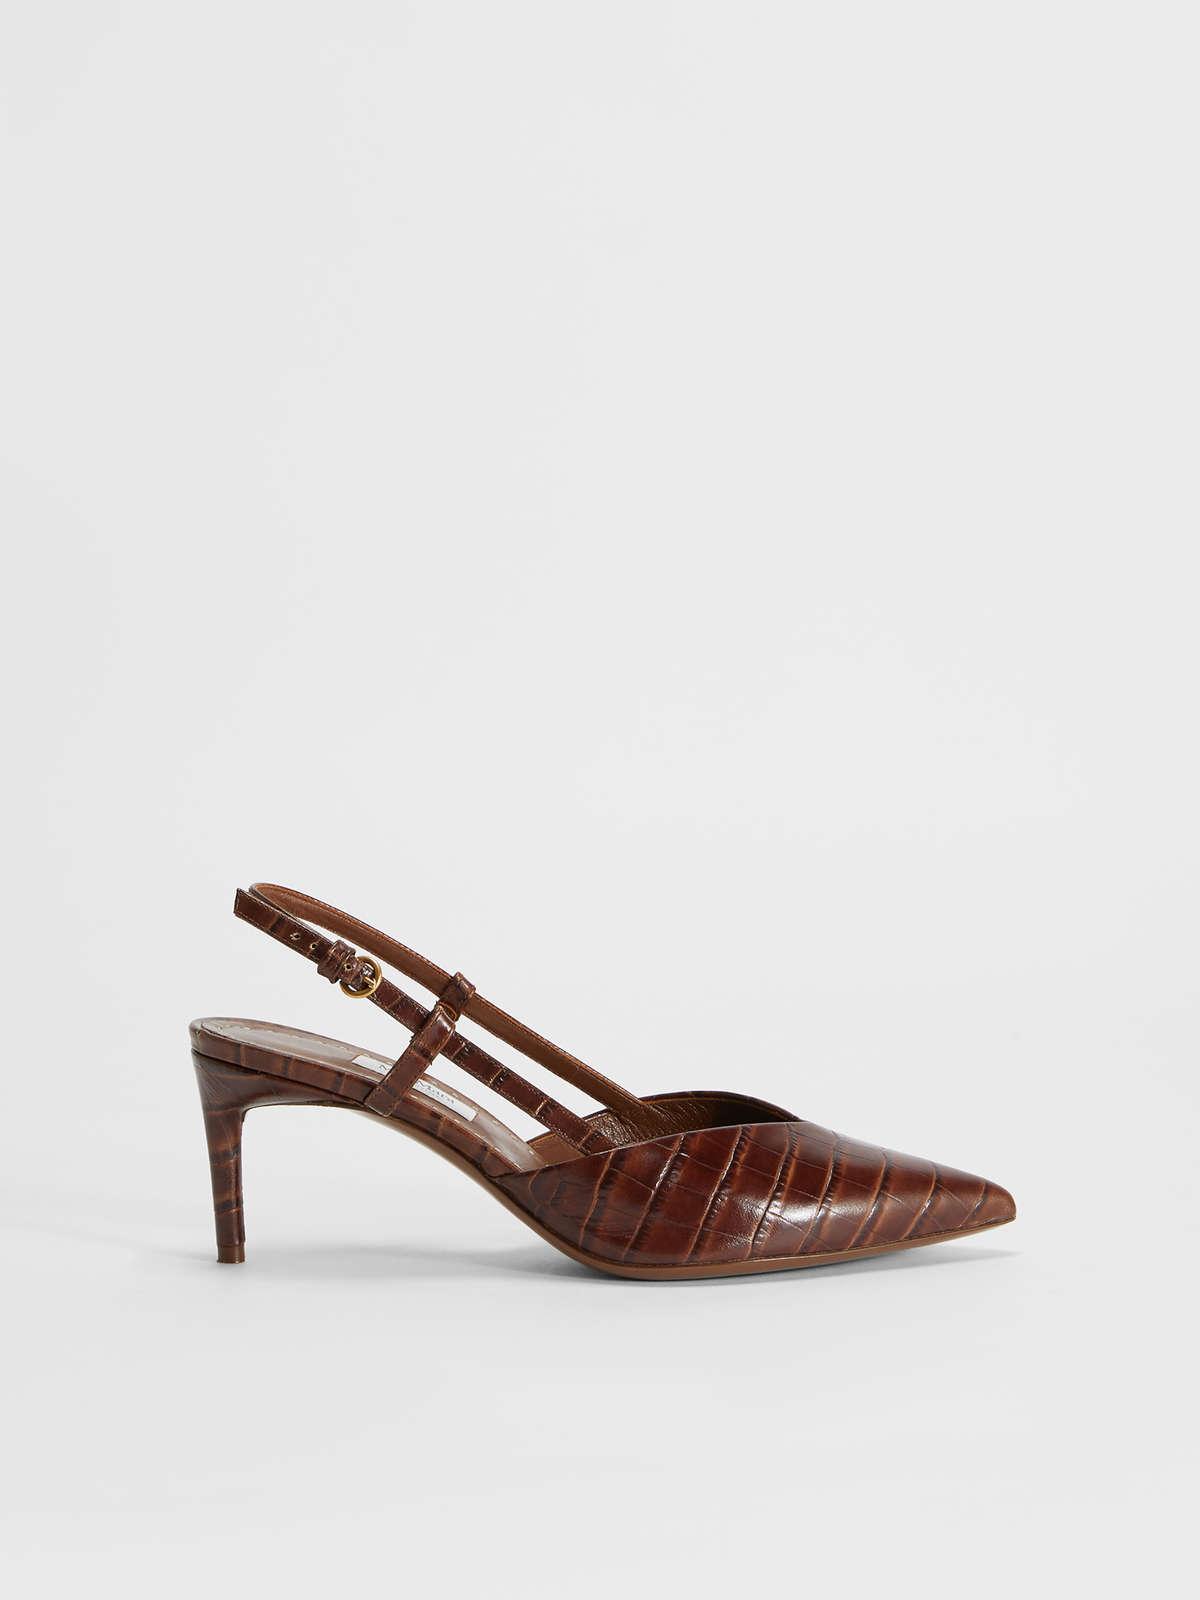 Crocodile print leather slingbacks - Max Mara